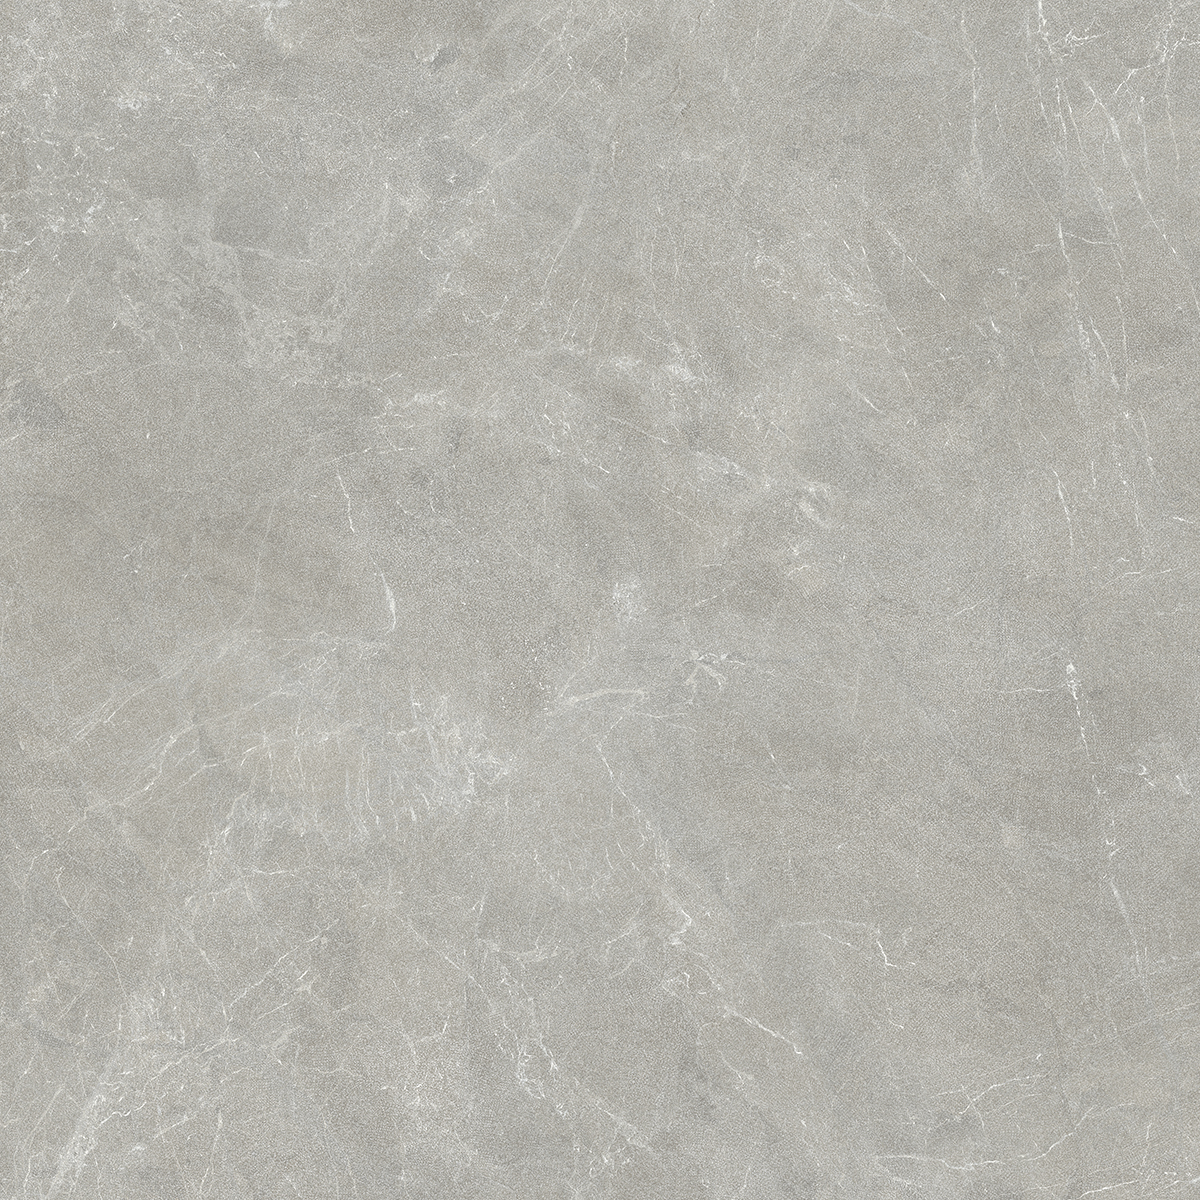 pz-living-ceramics-vonn-grey-hr